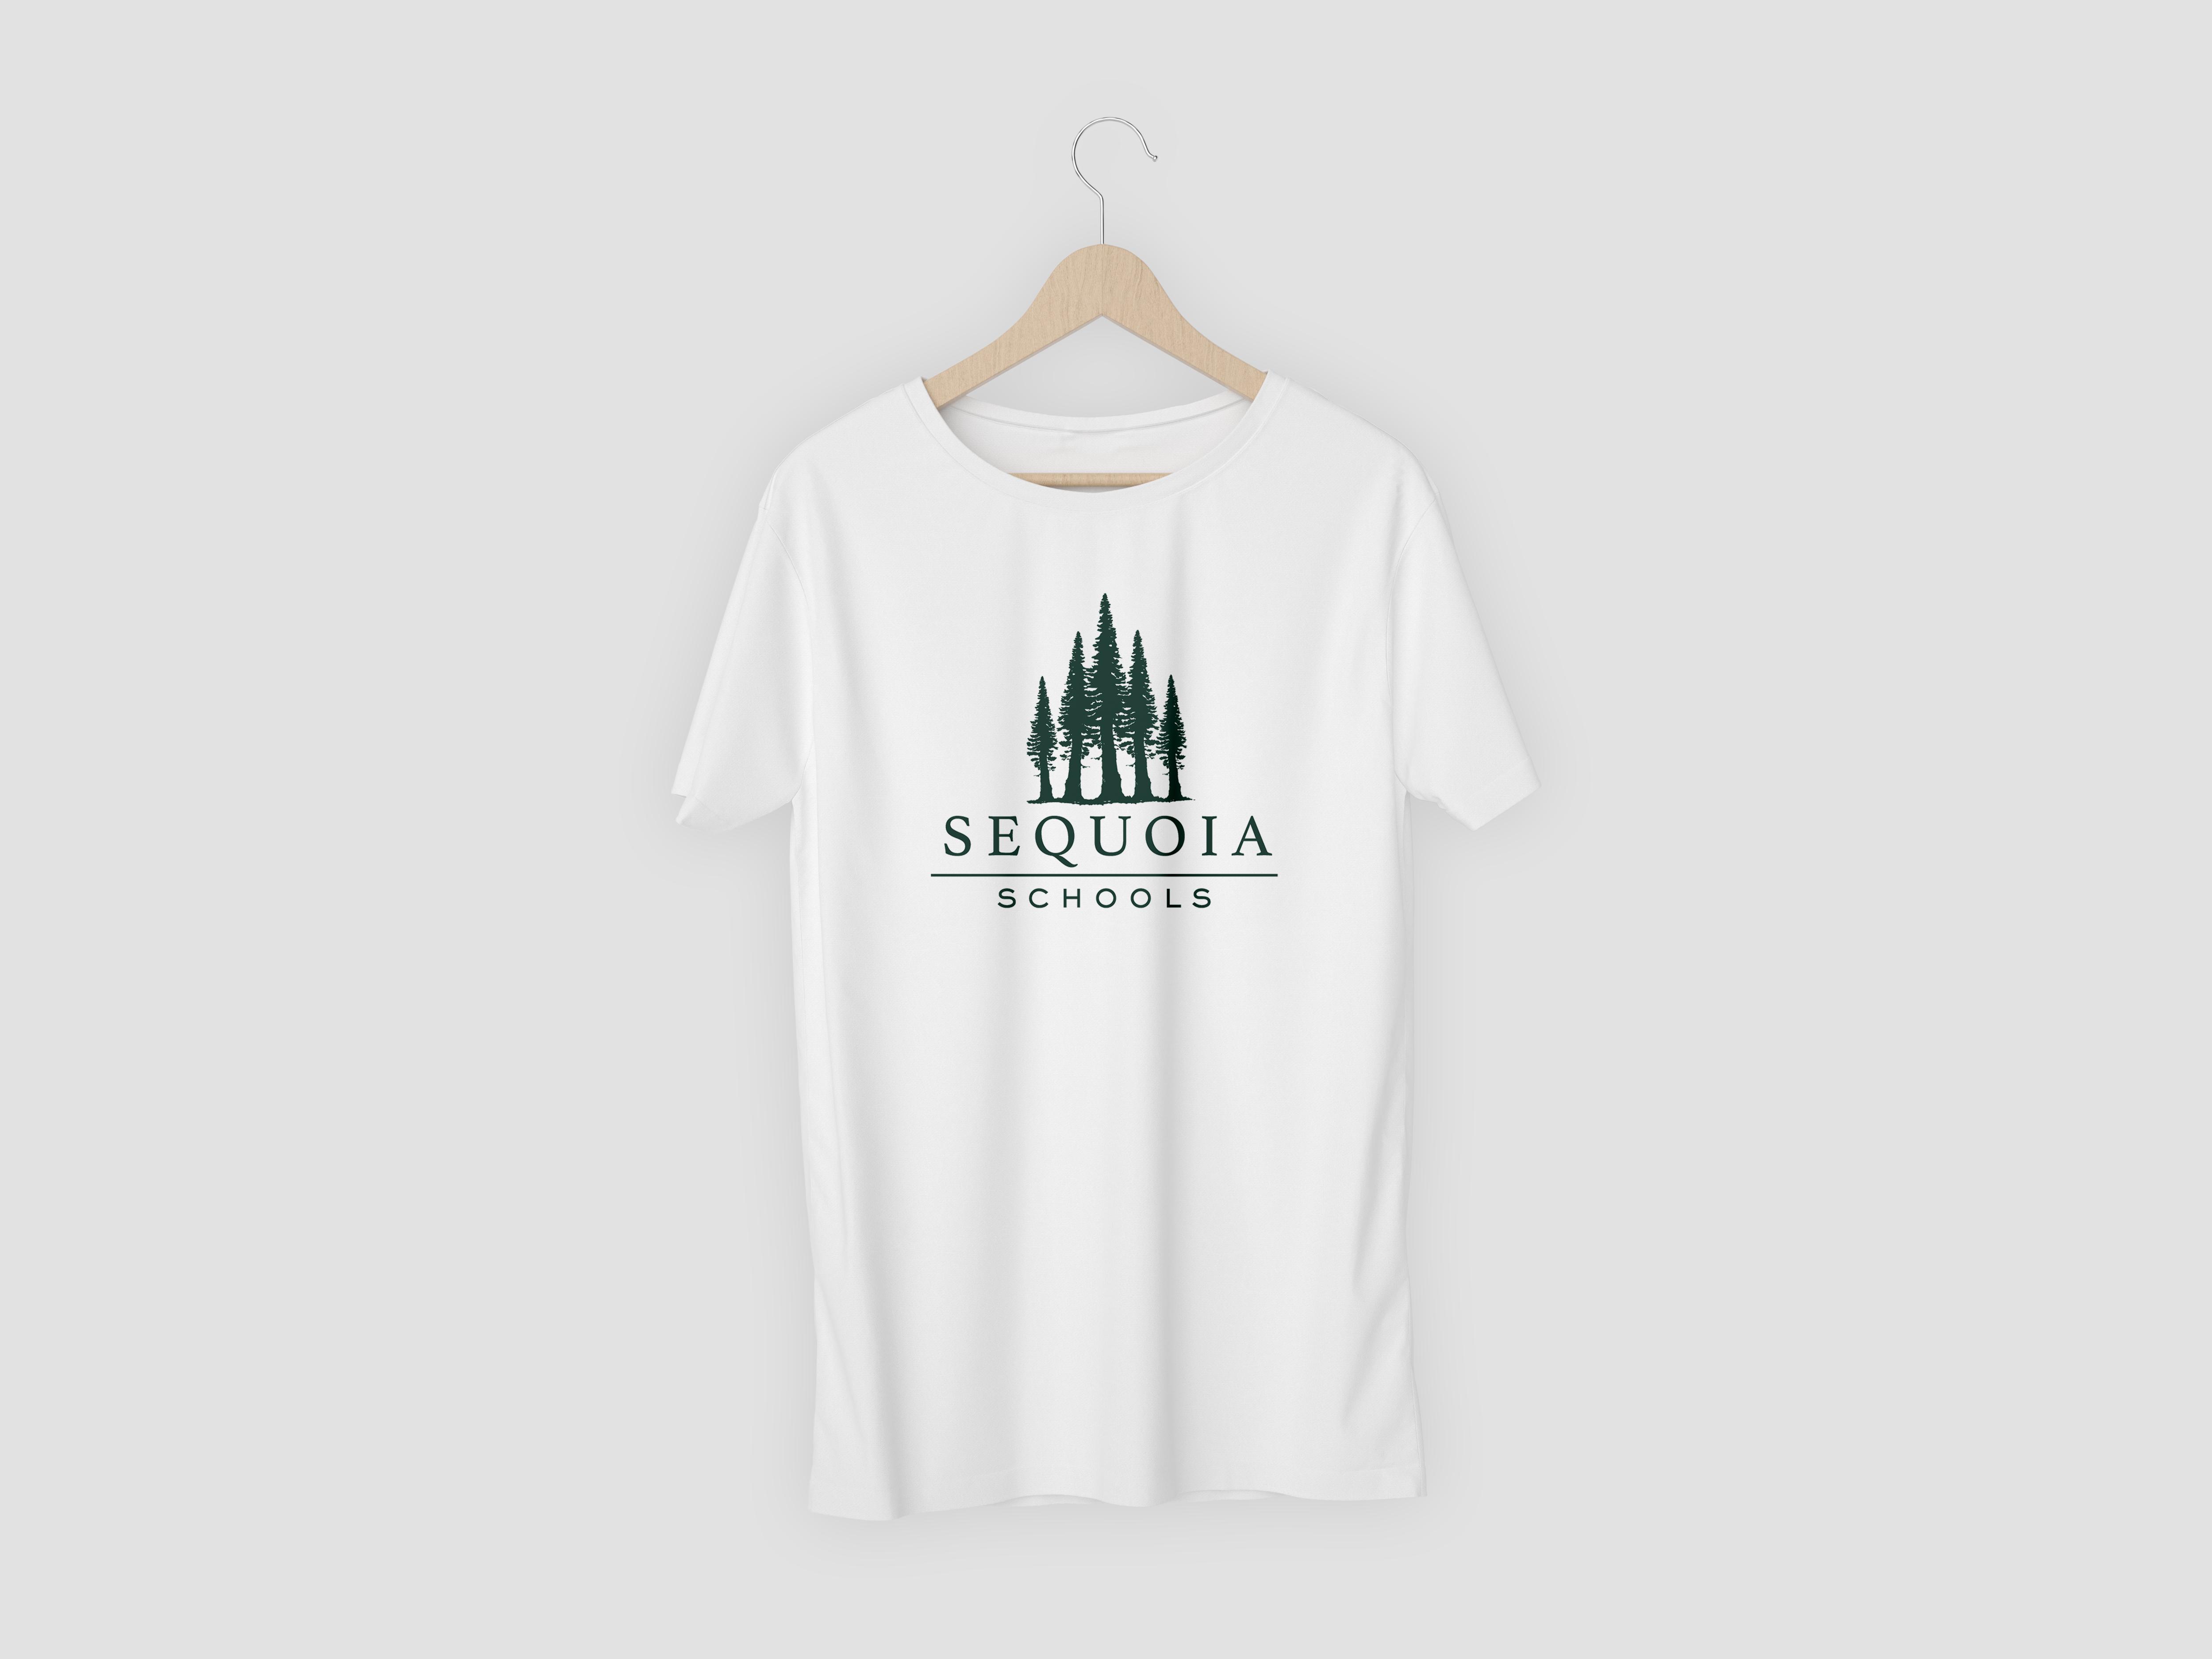 School T-shirt Design